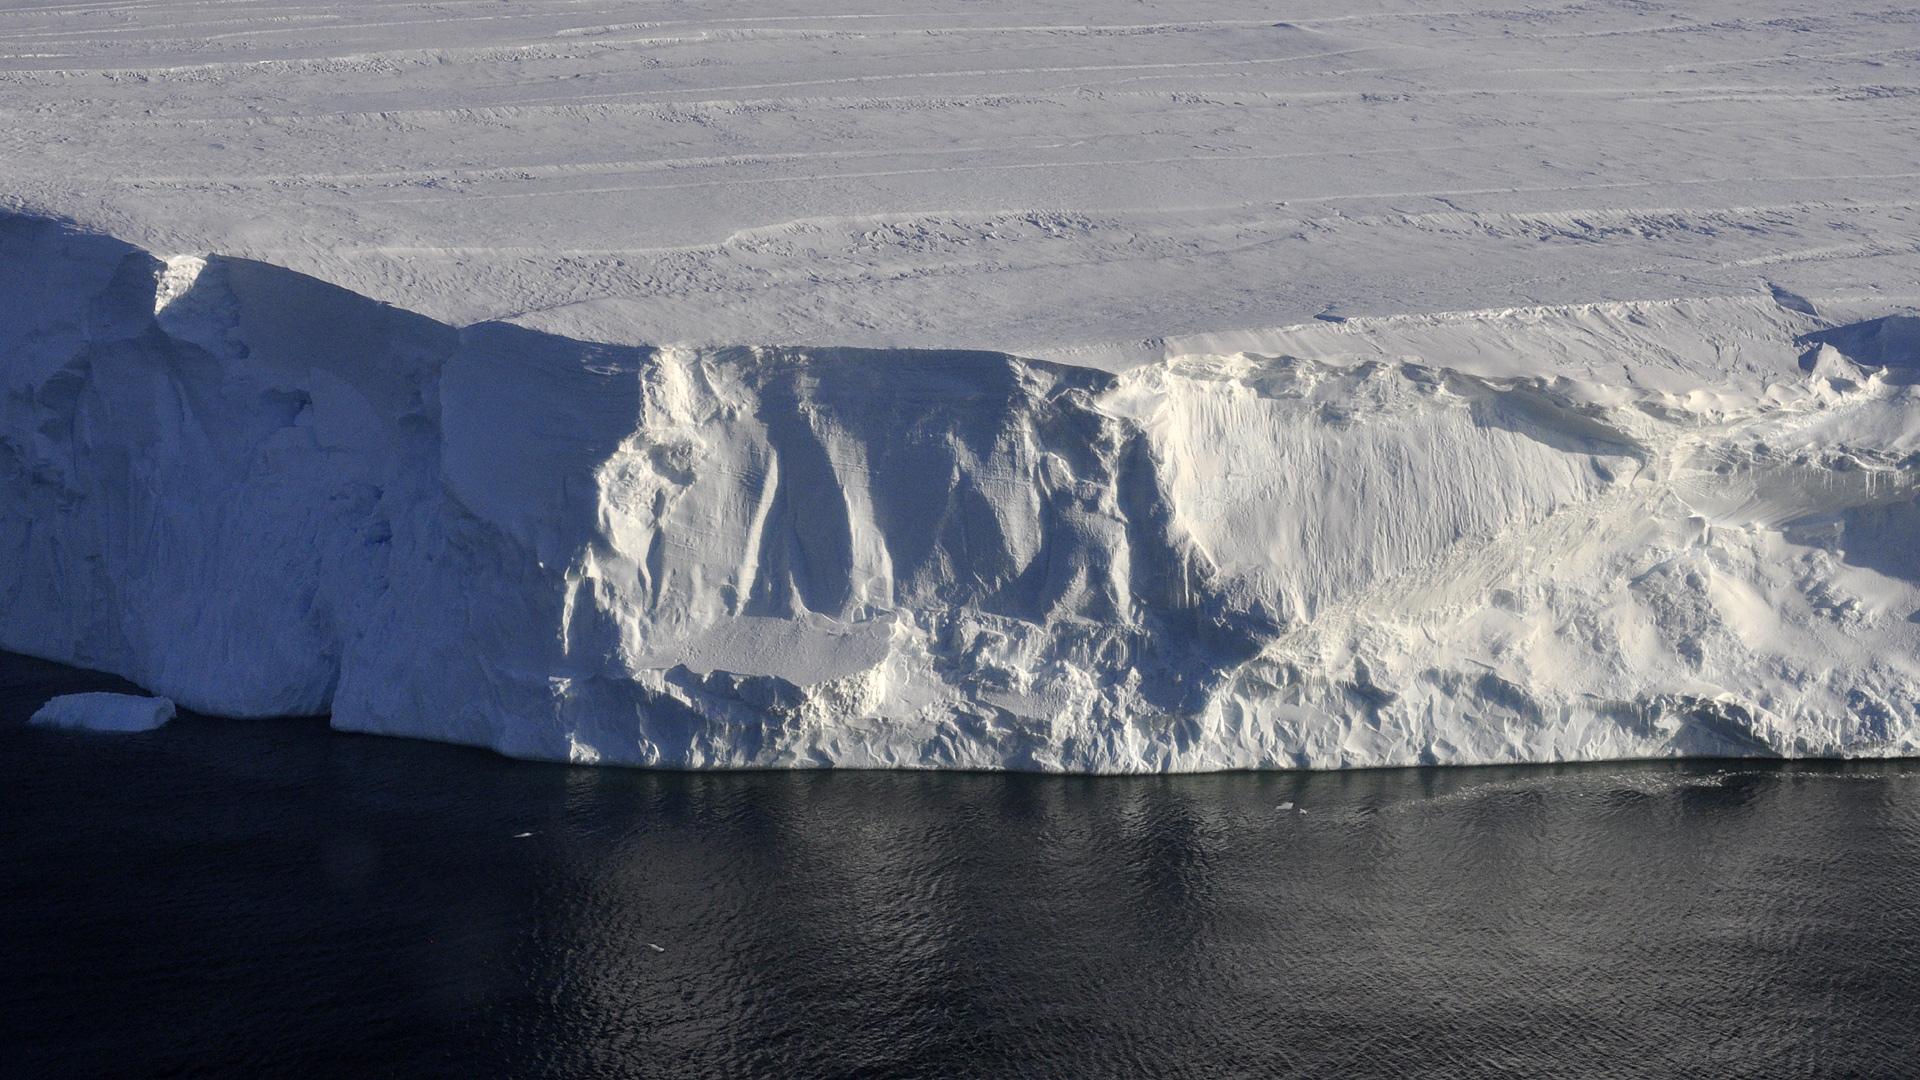 Cliffs of ice